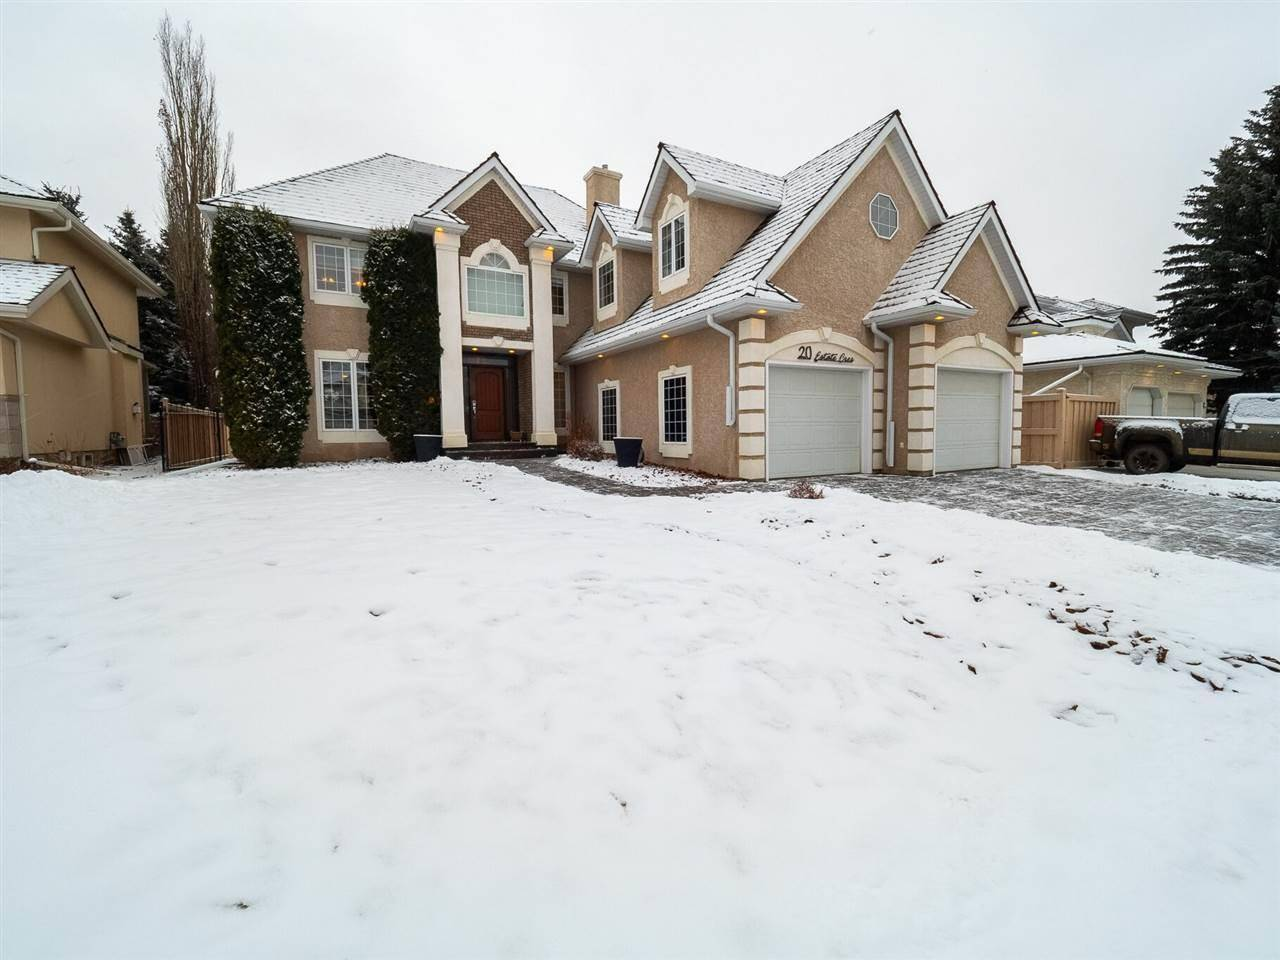 House for sale at 20 Estate Cres St. Albert Alberta - MLS: E4181493